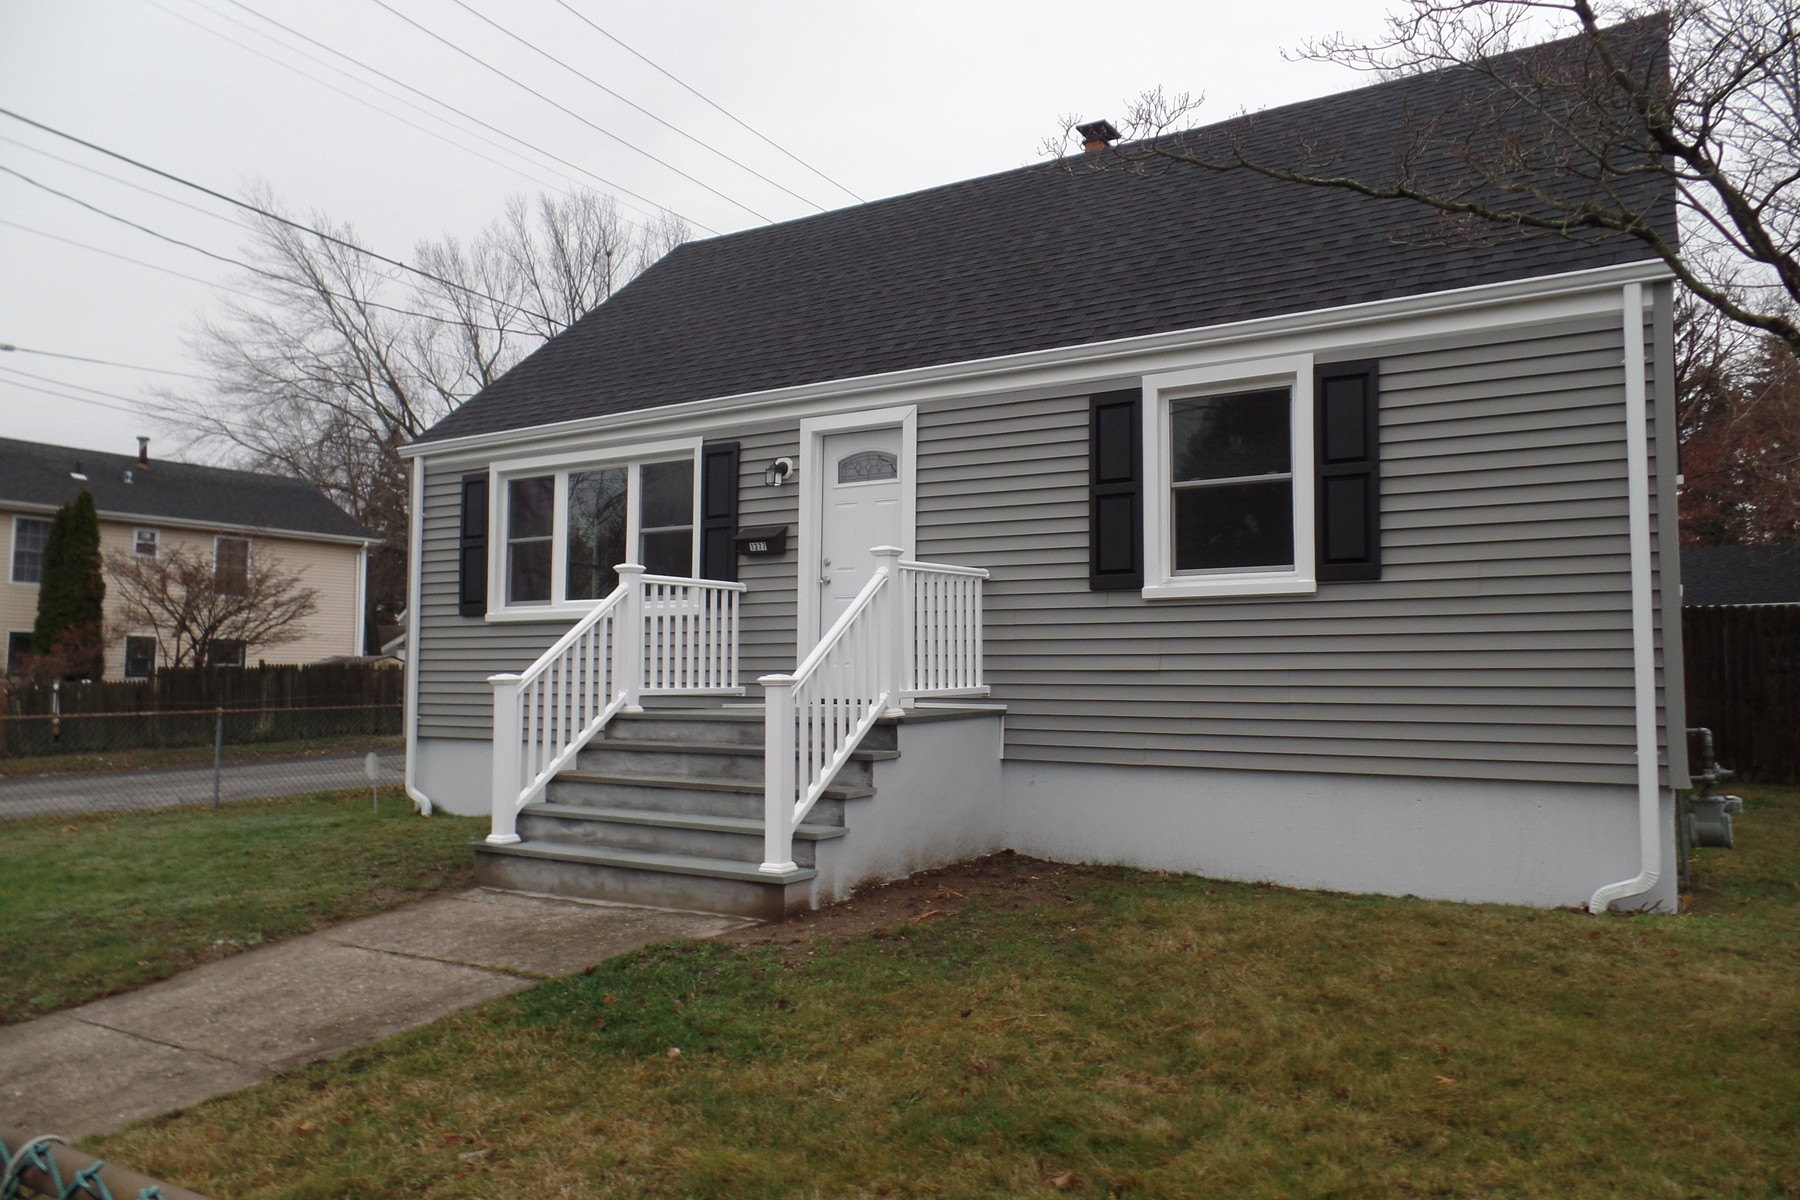 Casa para uma família para Venda às Updated Cape in Move In Condtion on Large Corner Lot 1377 Sylvan Avenue Bridgeport, Connecticut 06606 Estados Unidos